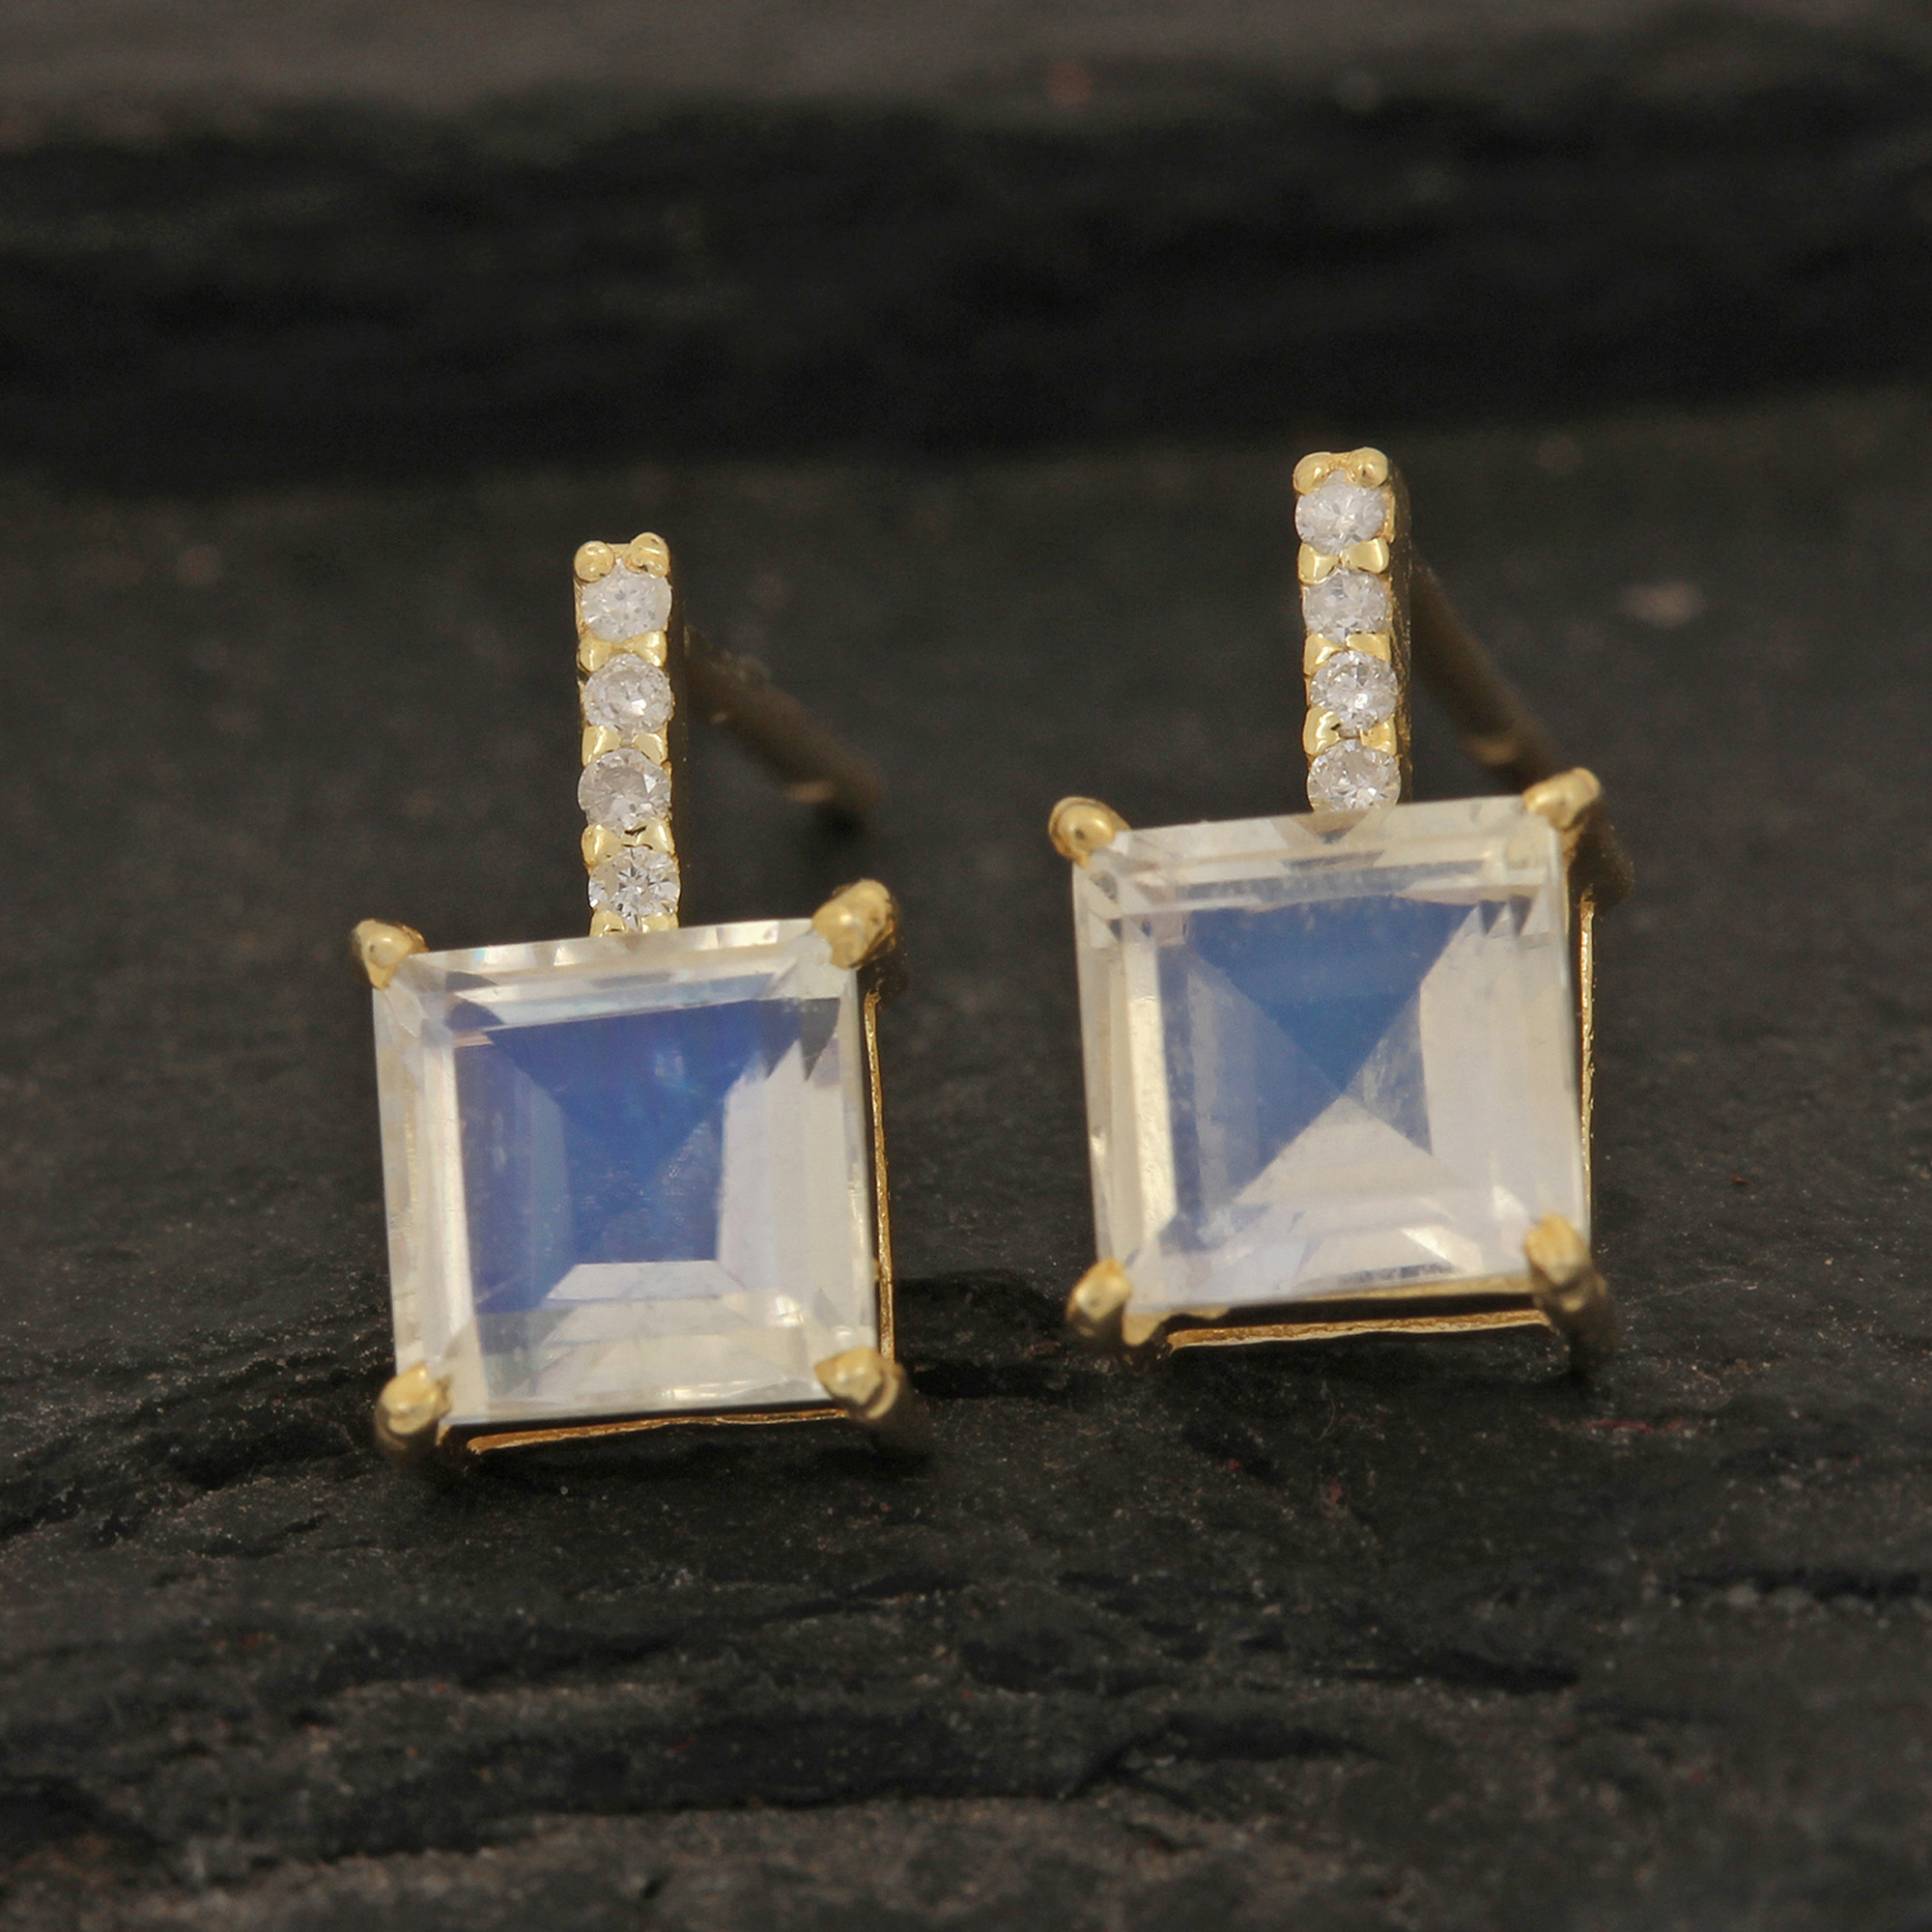 Natural Diamond & Rainbow Moonstone Stud Earrings 14k Solid Gold Jewelry